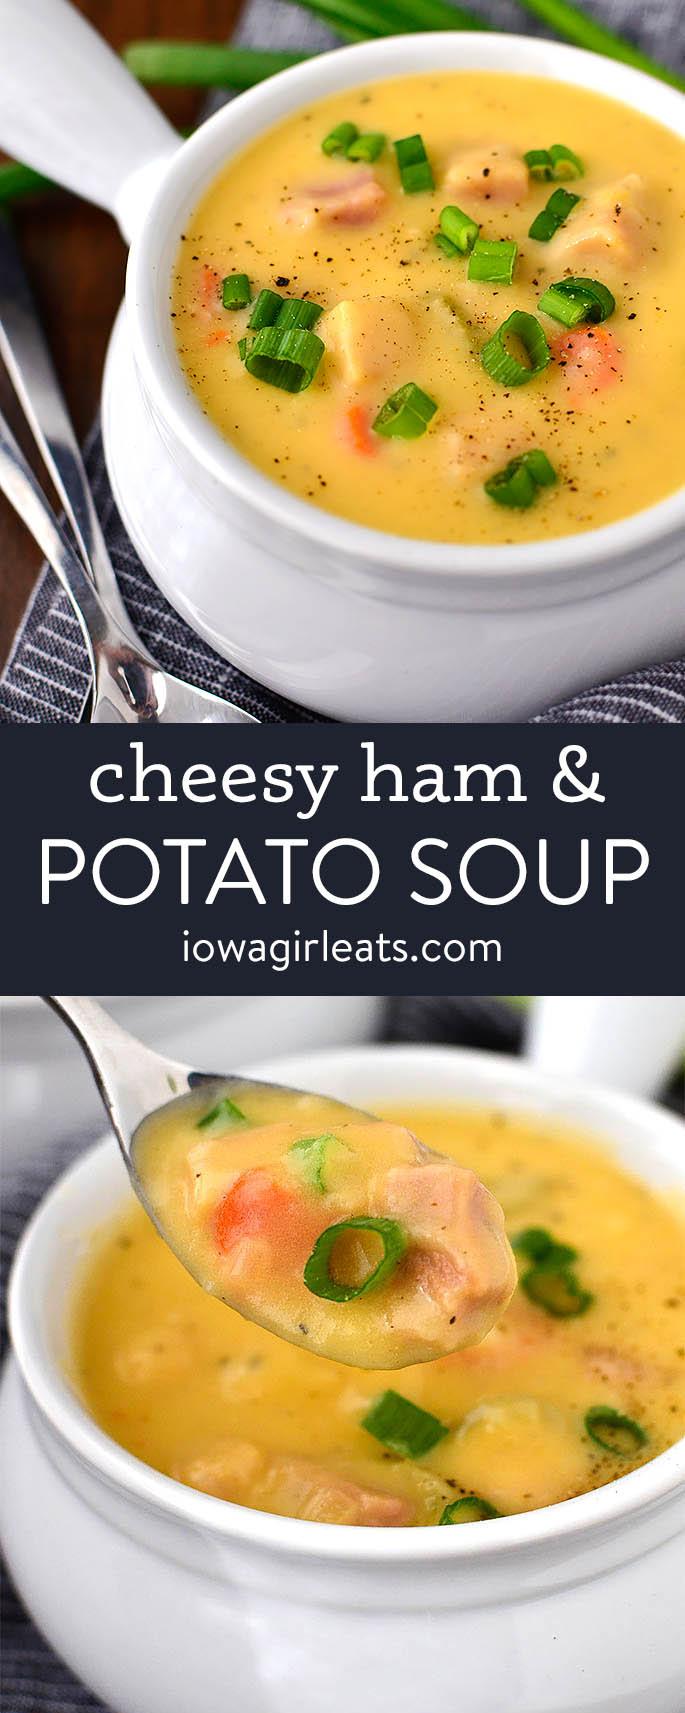 photo collage of cheesy ham and potato soup